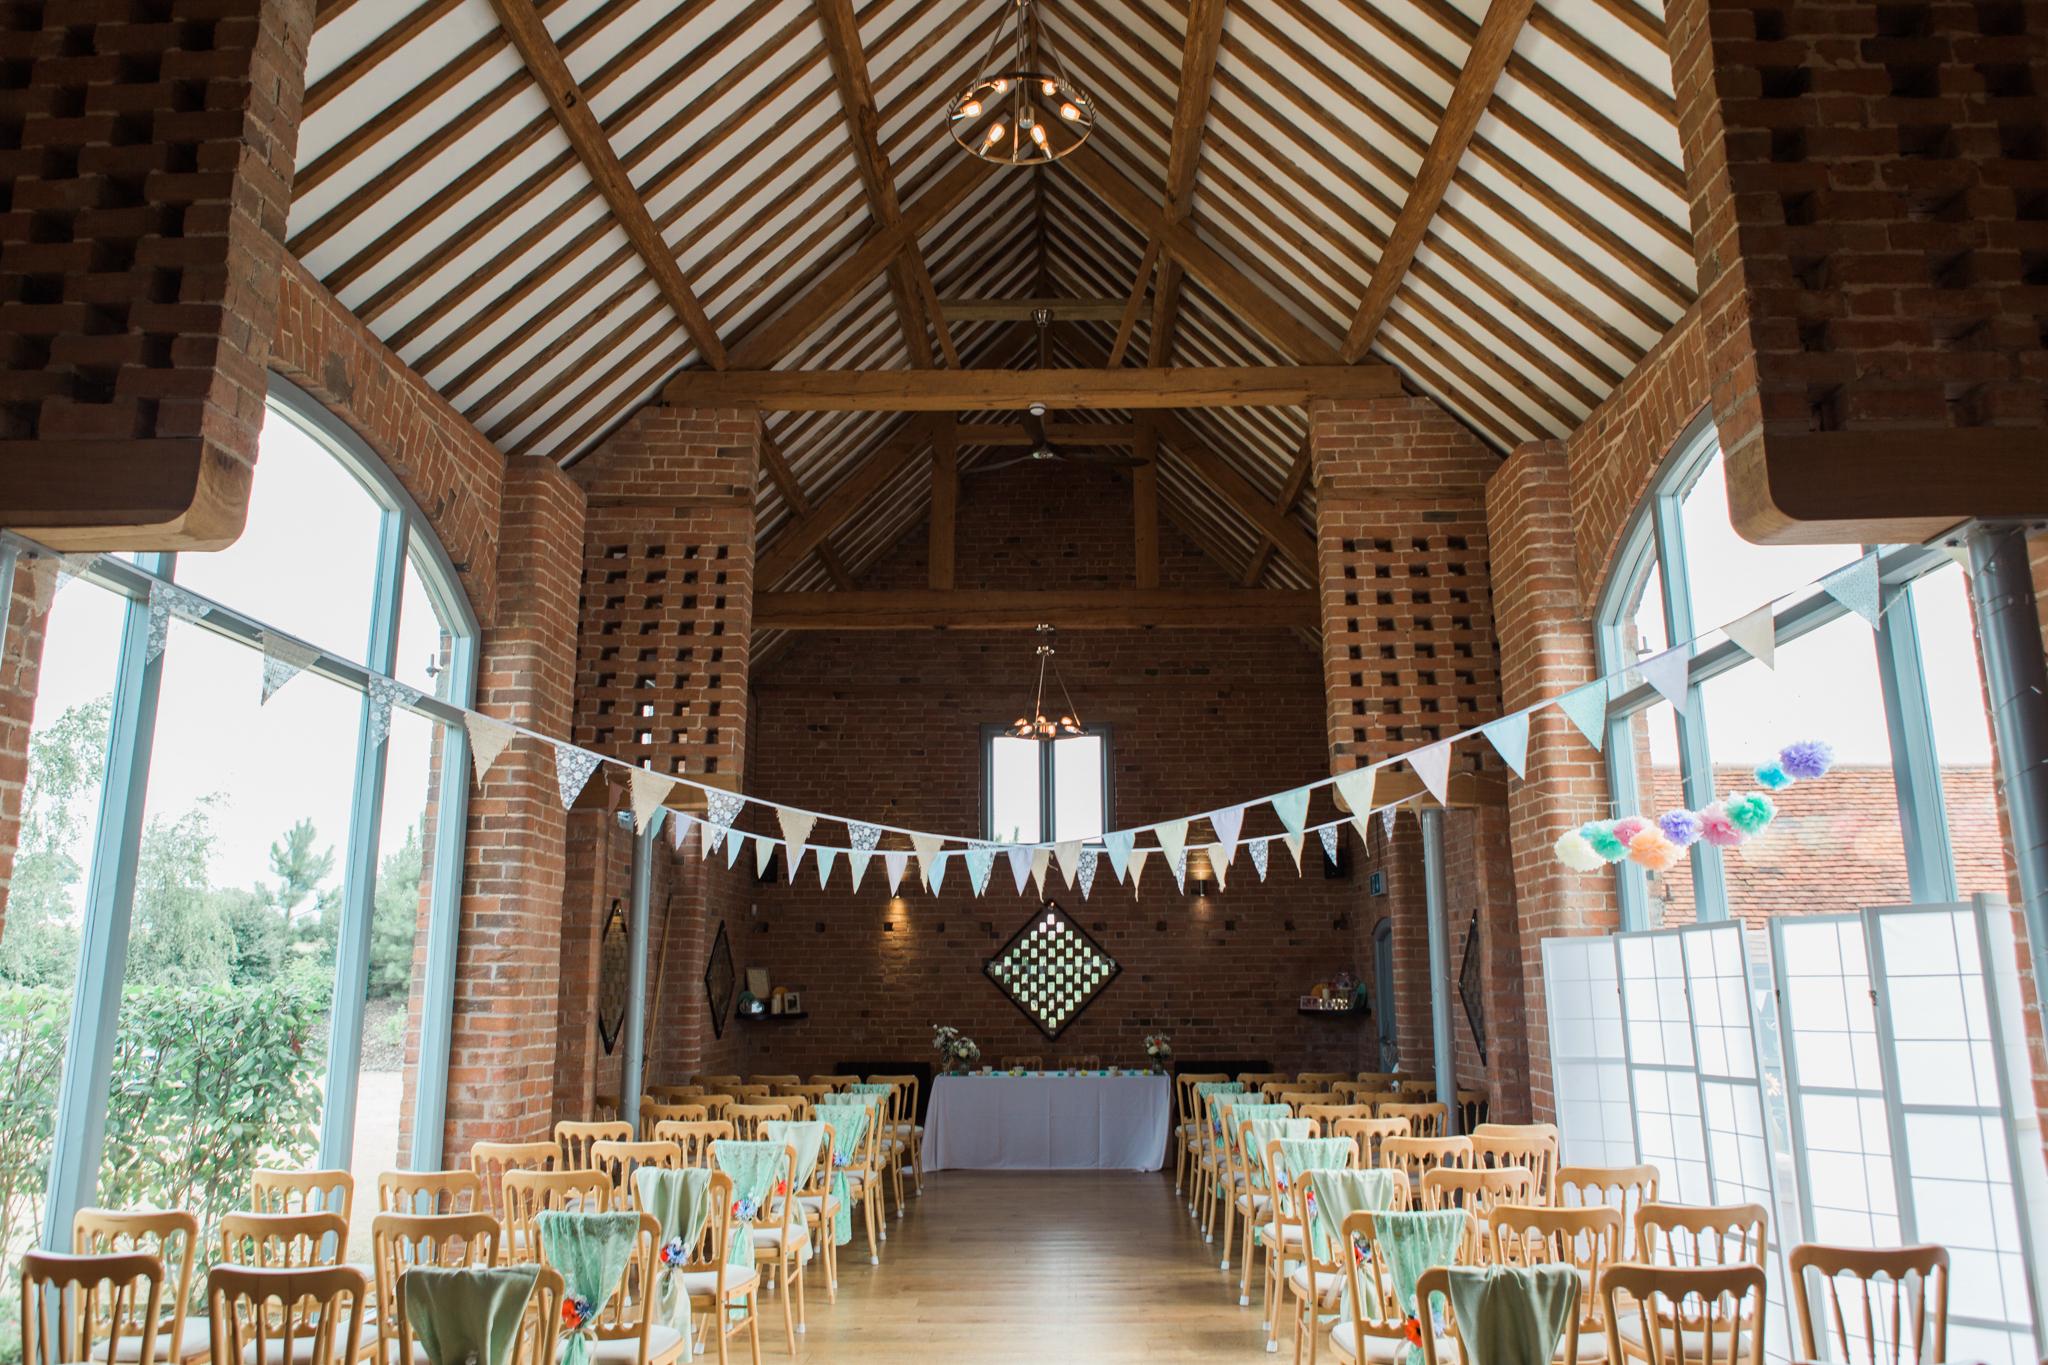 Rowsie & Lee, Swallows Nest Barn Wedding, Cotswold wedding photographer, Warwickshire Wedding Photographer-22.jpg